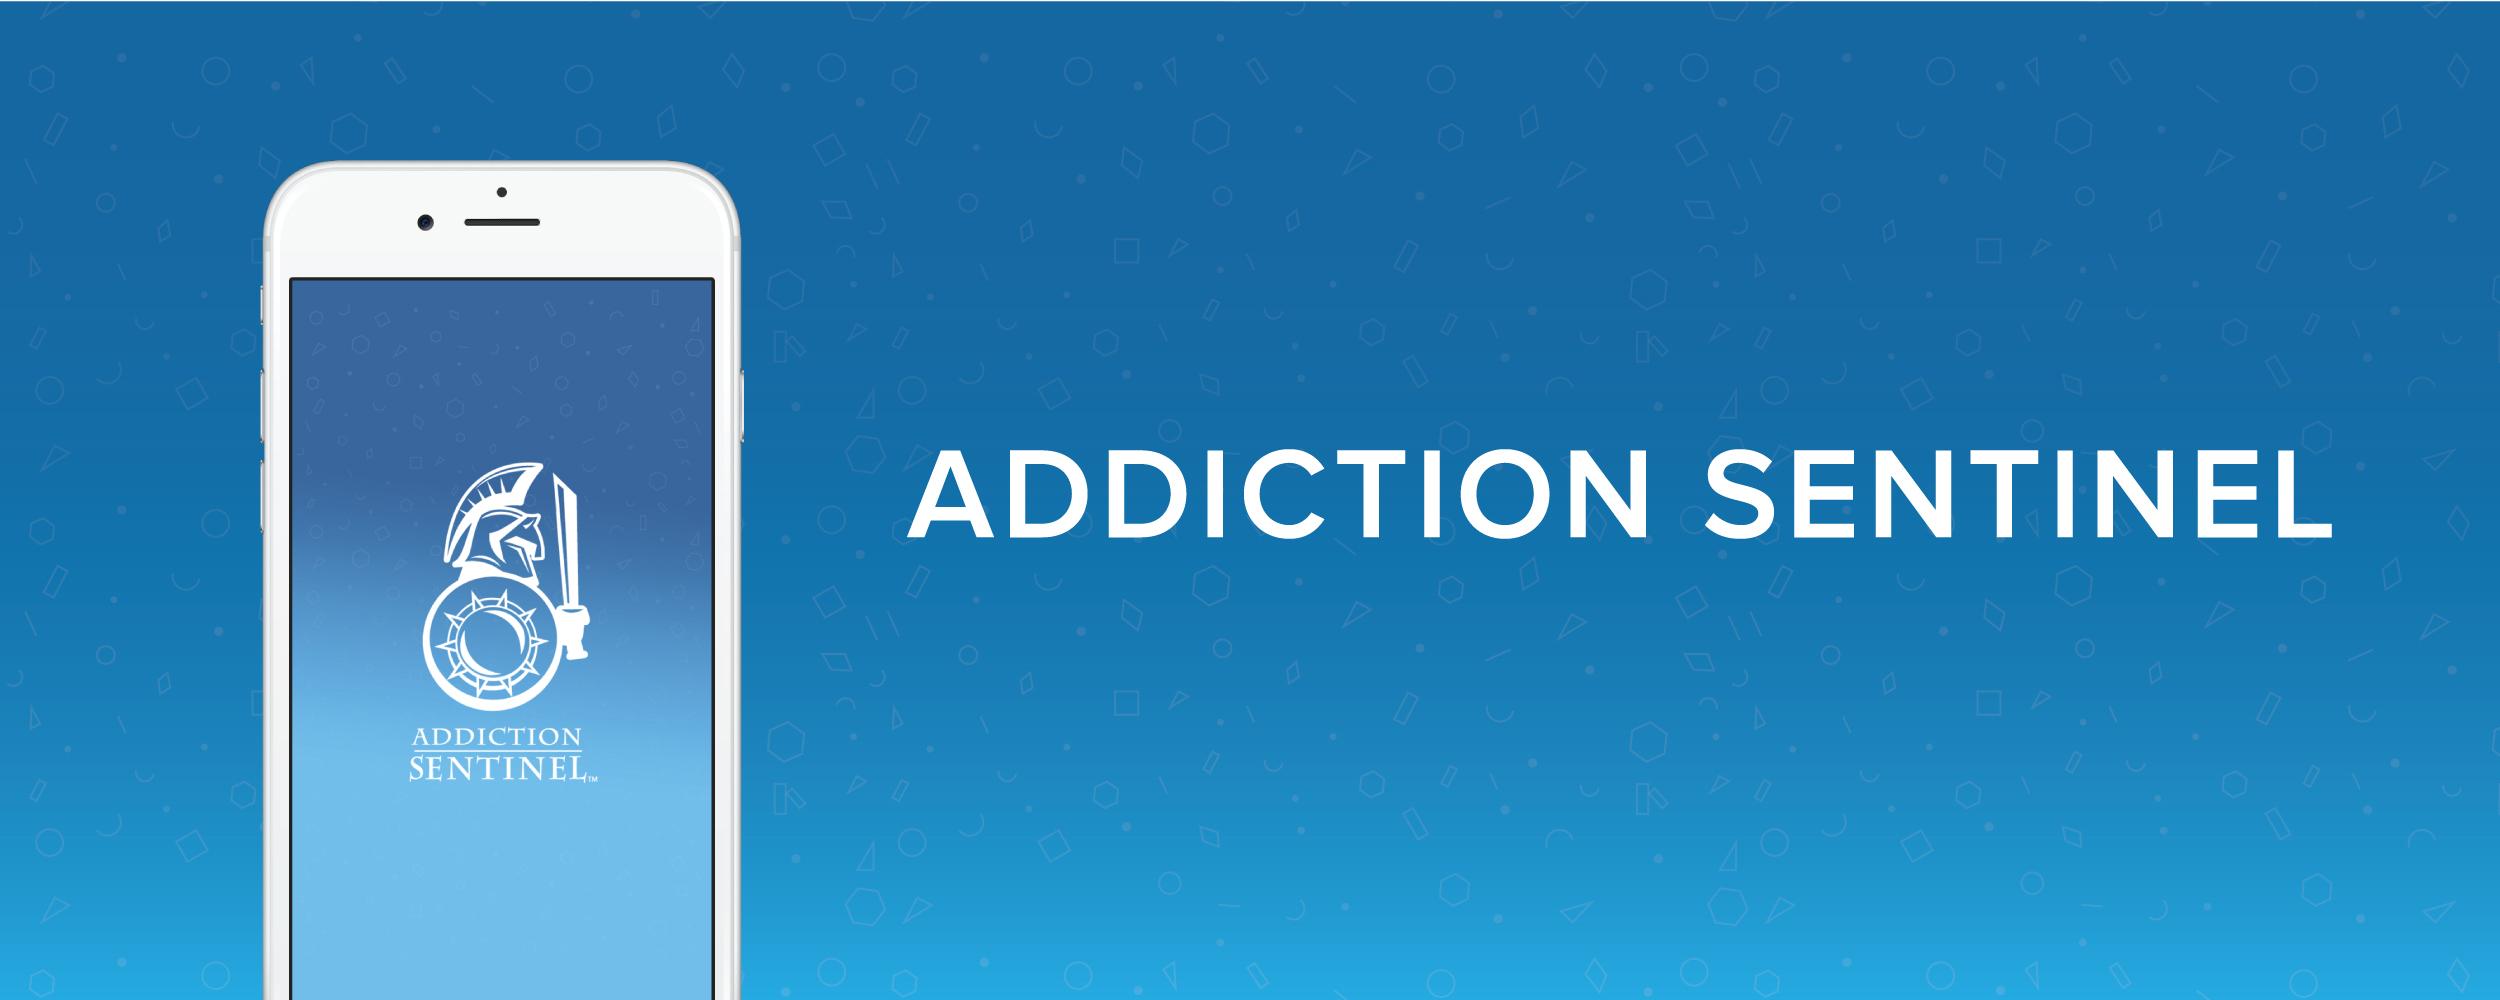 CaseStudy_AddictionSentinel_NEW.jpg